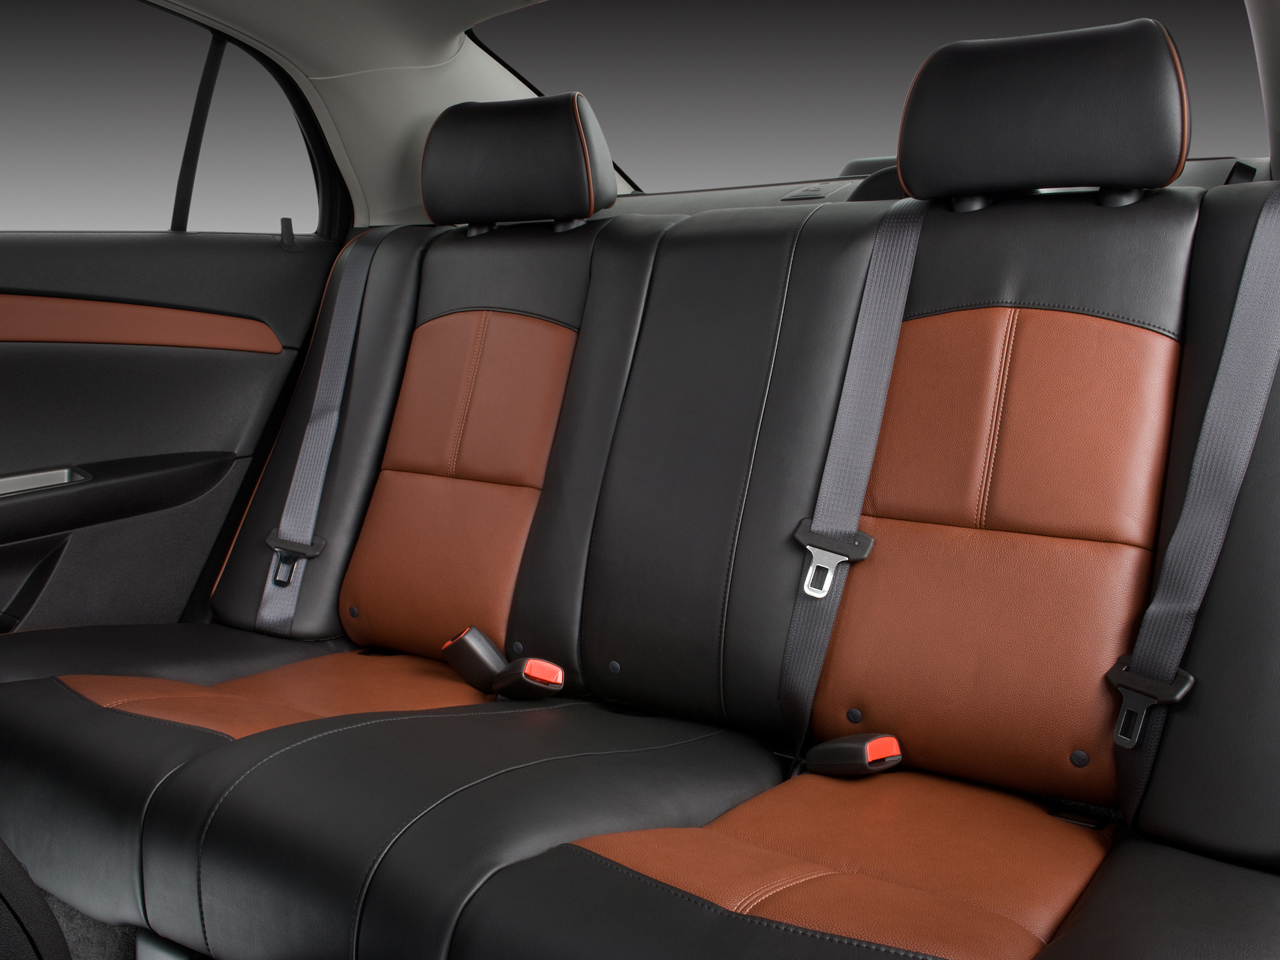 Malibu 2011 chevy malibu seat covers : 2009 Chevy Malibu LTZ - Fuel Efficient News, Car Features and ...